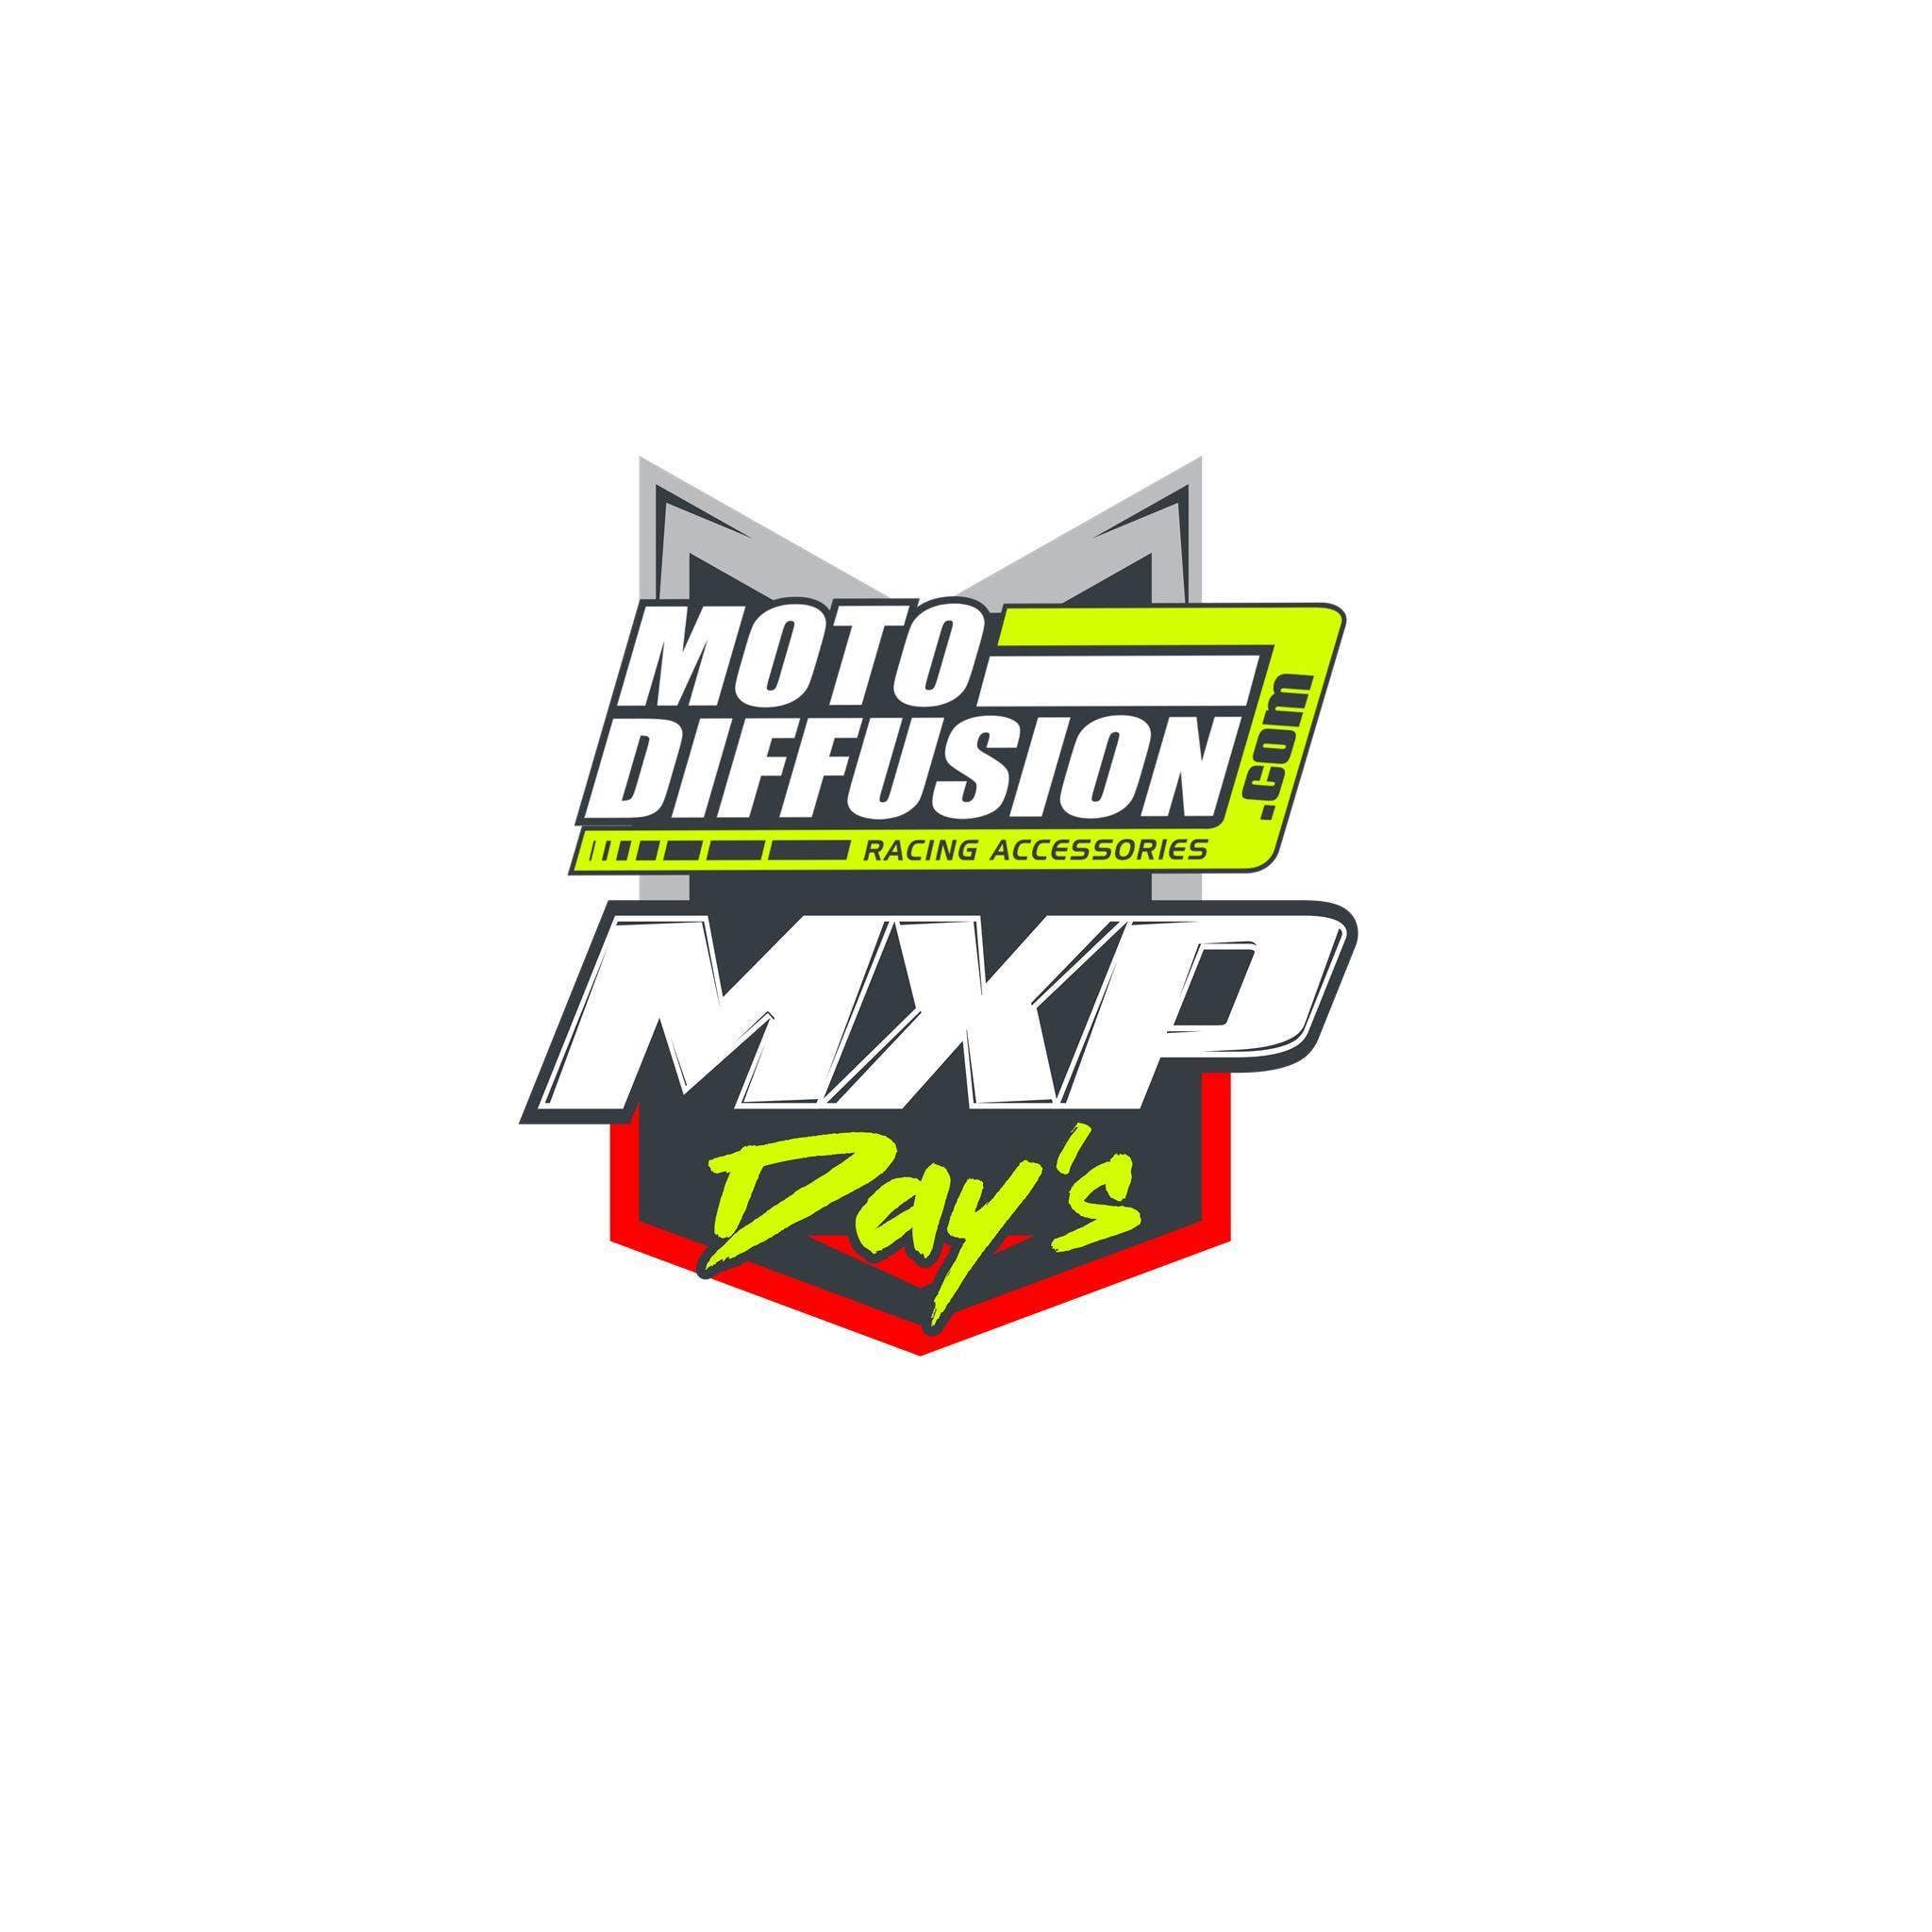 MOTODIFFUSION MXP DAY'S